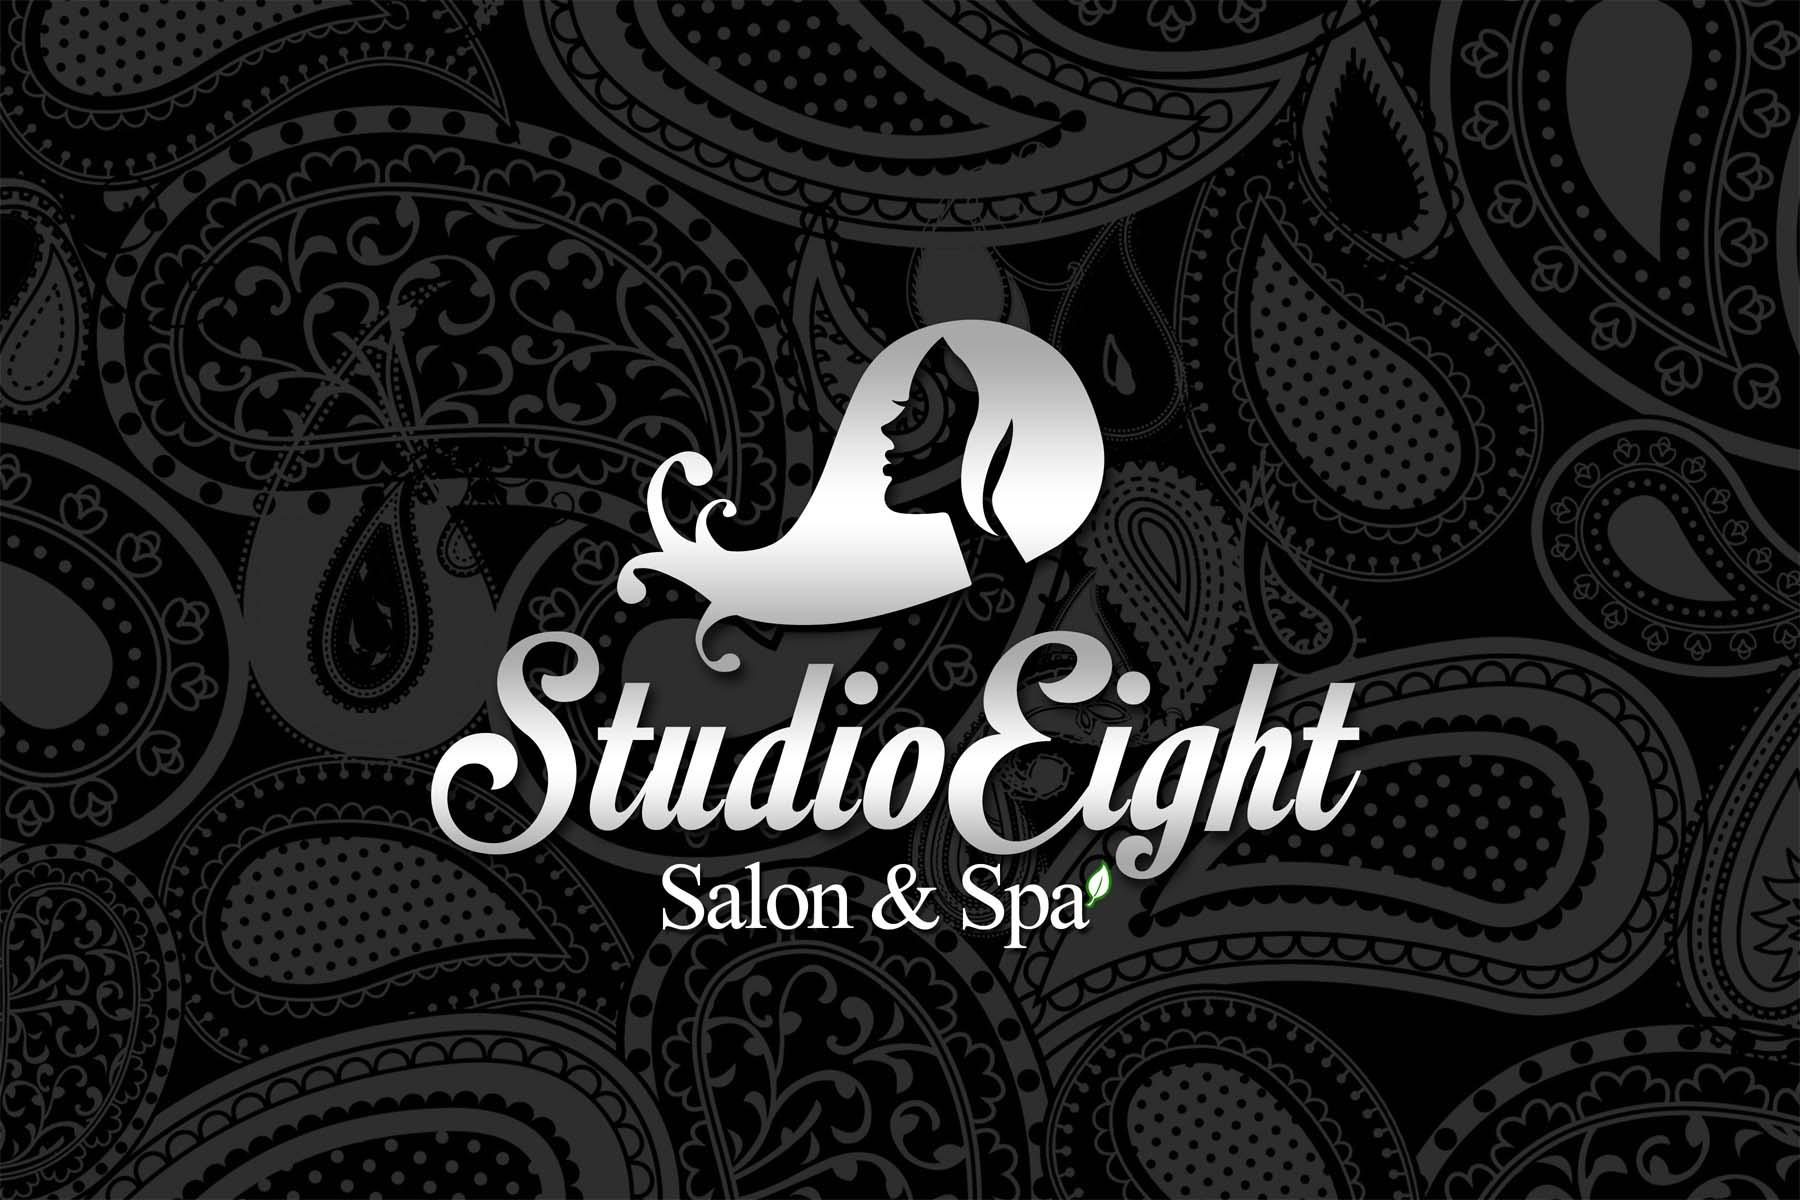 Logo Design by Private User - Entry No. 97 in the Logo Design Contest Captivating Logo Design for studio eight salon & spa.